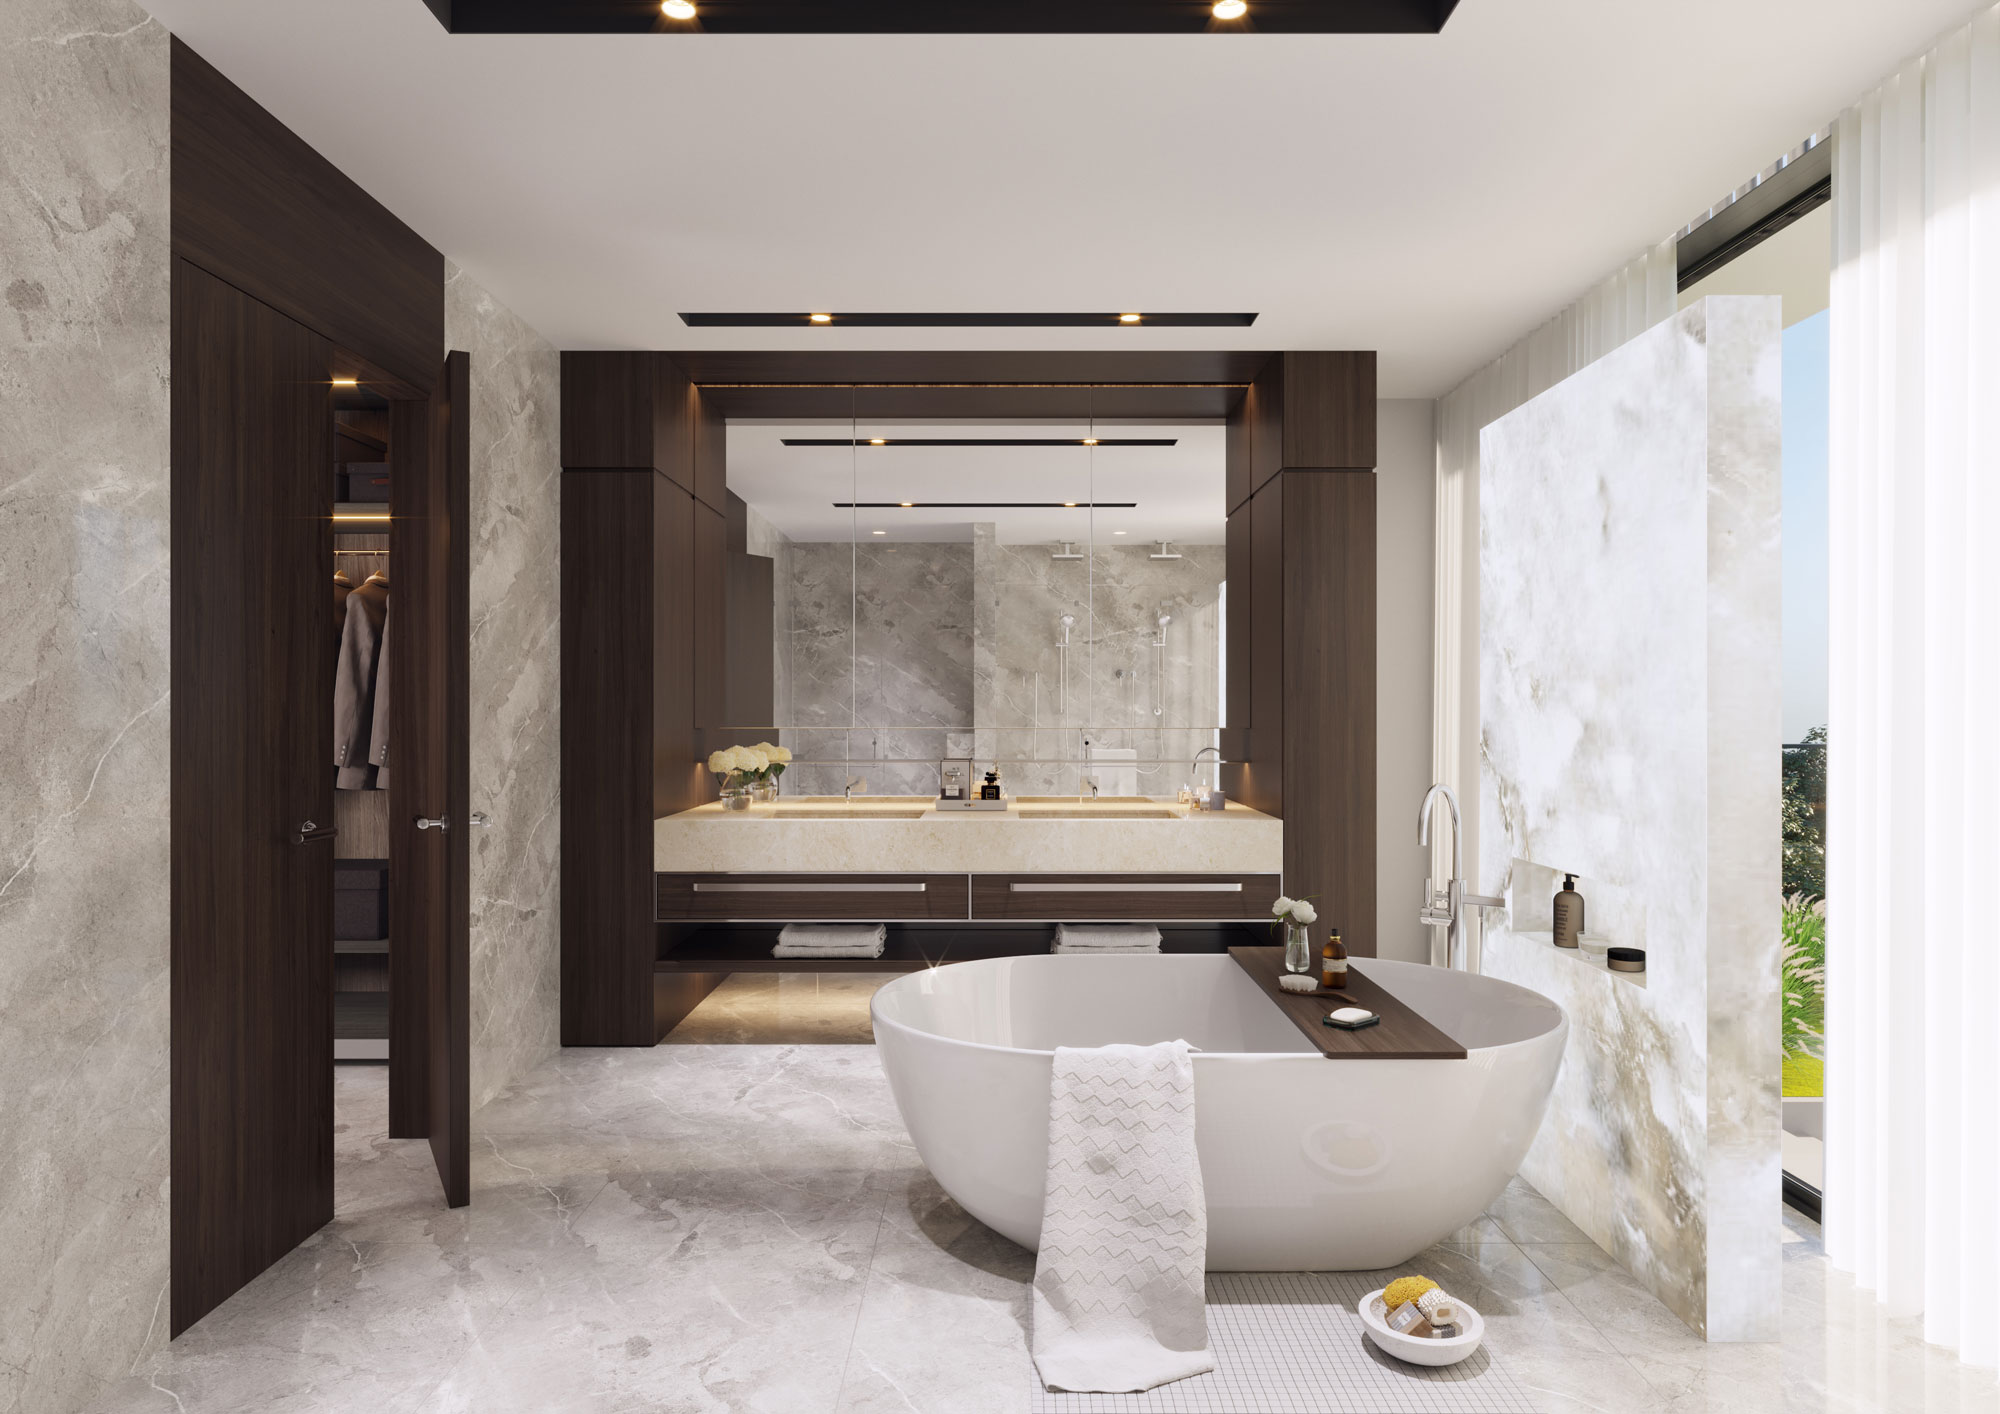 DH-2nd-floor-Bathroom-Option-01